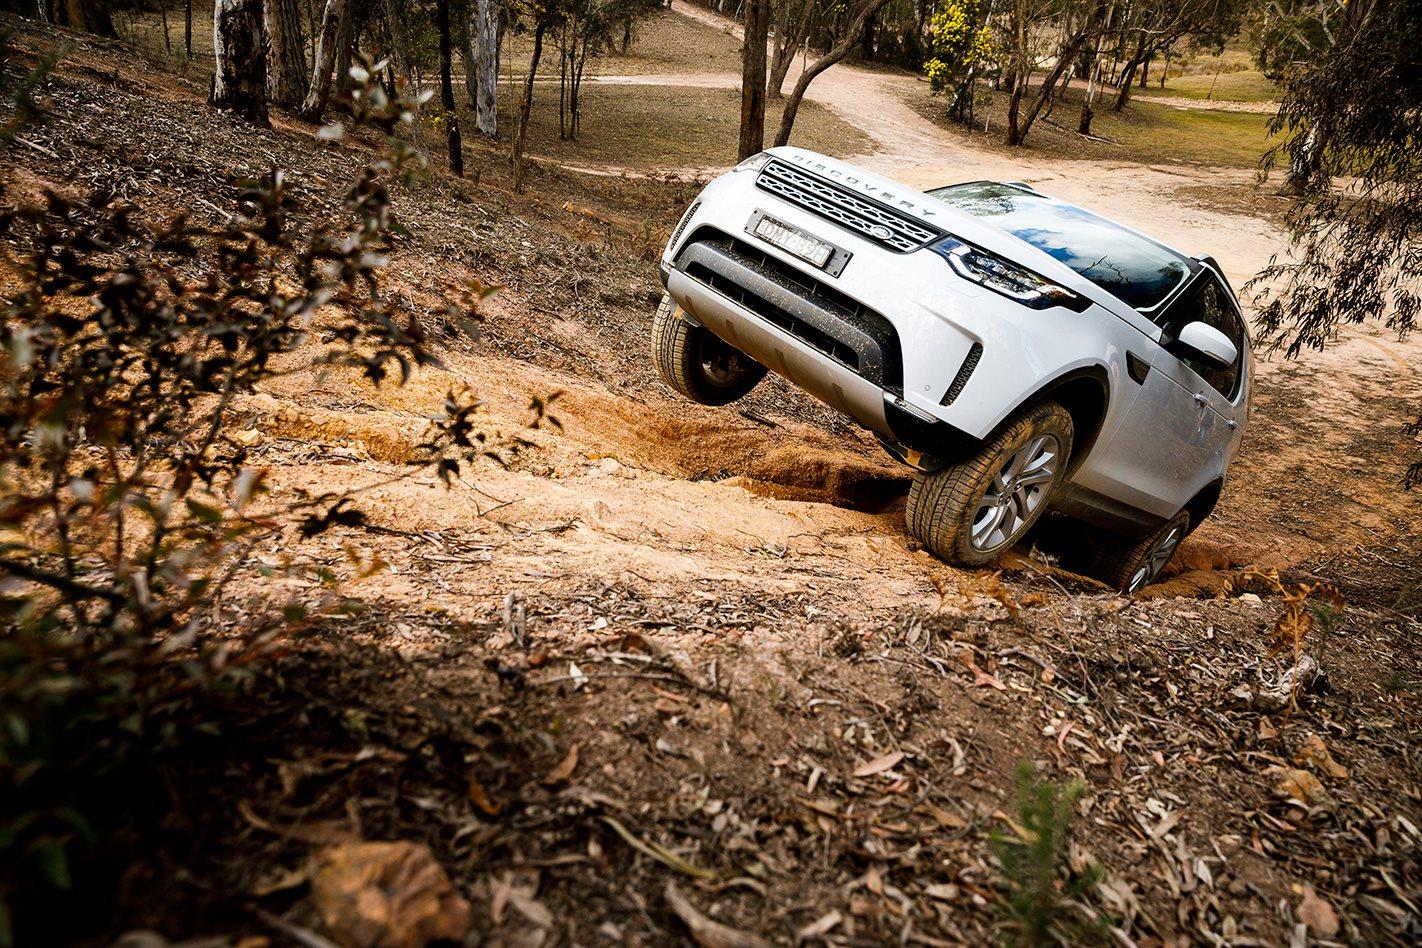 2017 Land Rover Discovery hillclimb.jpg